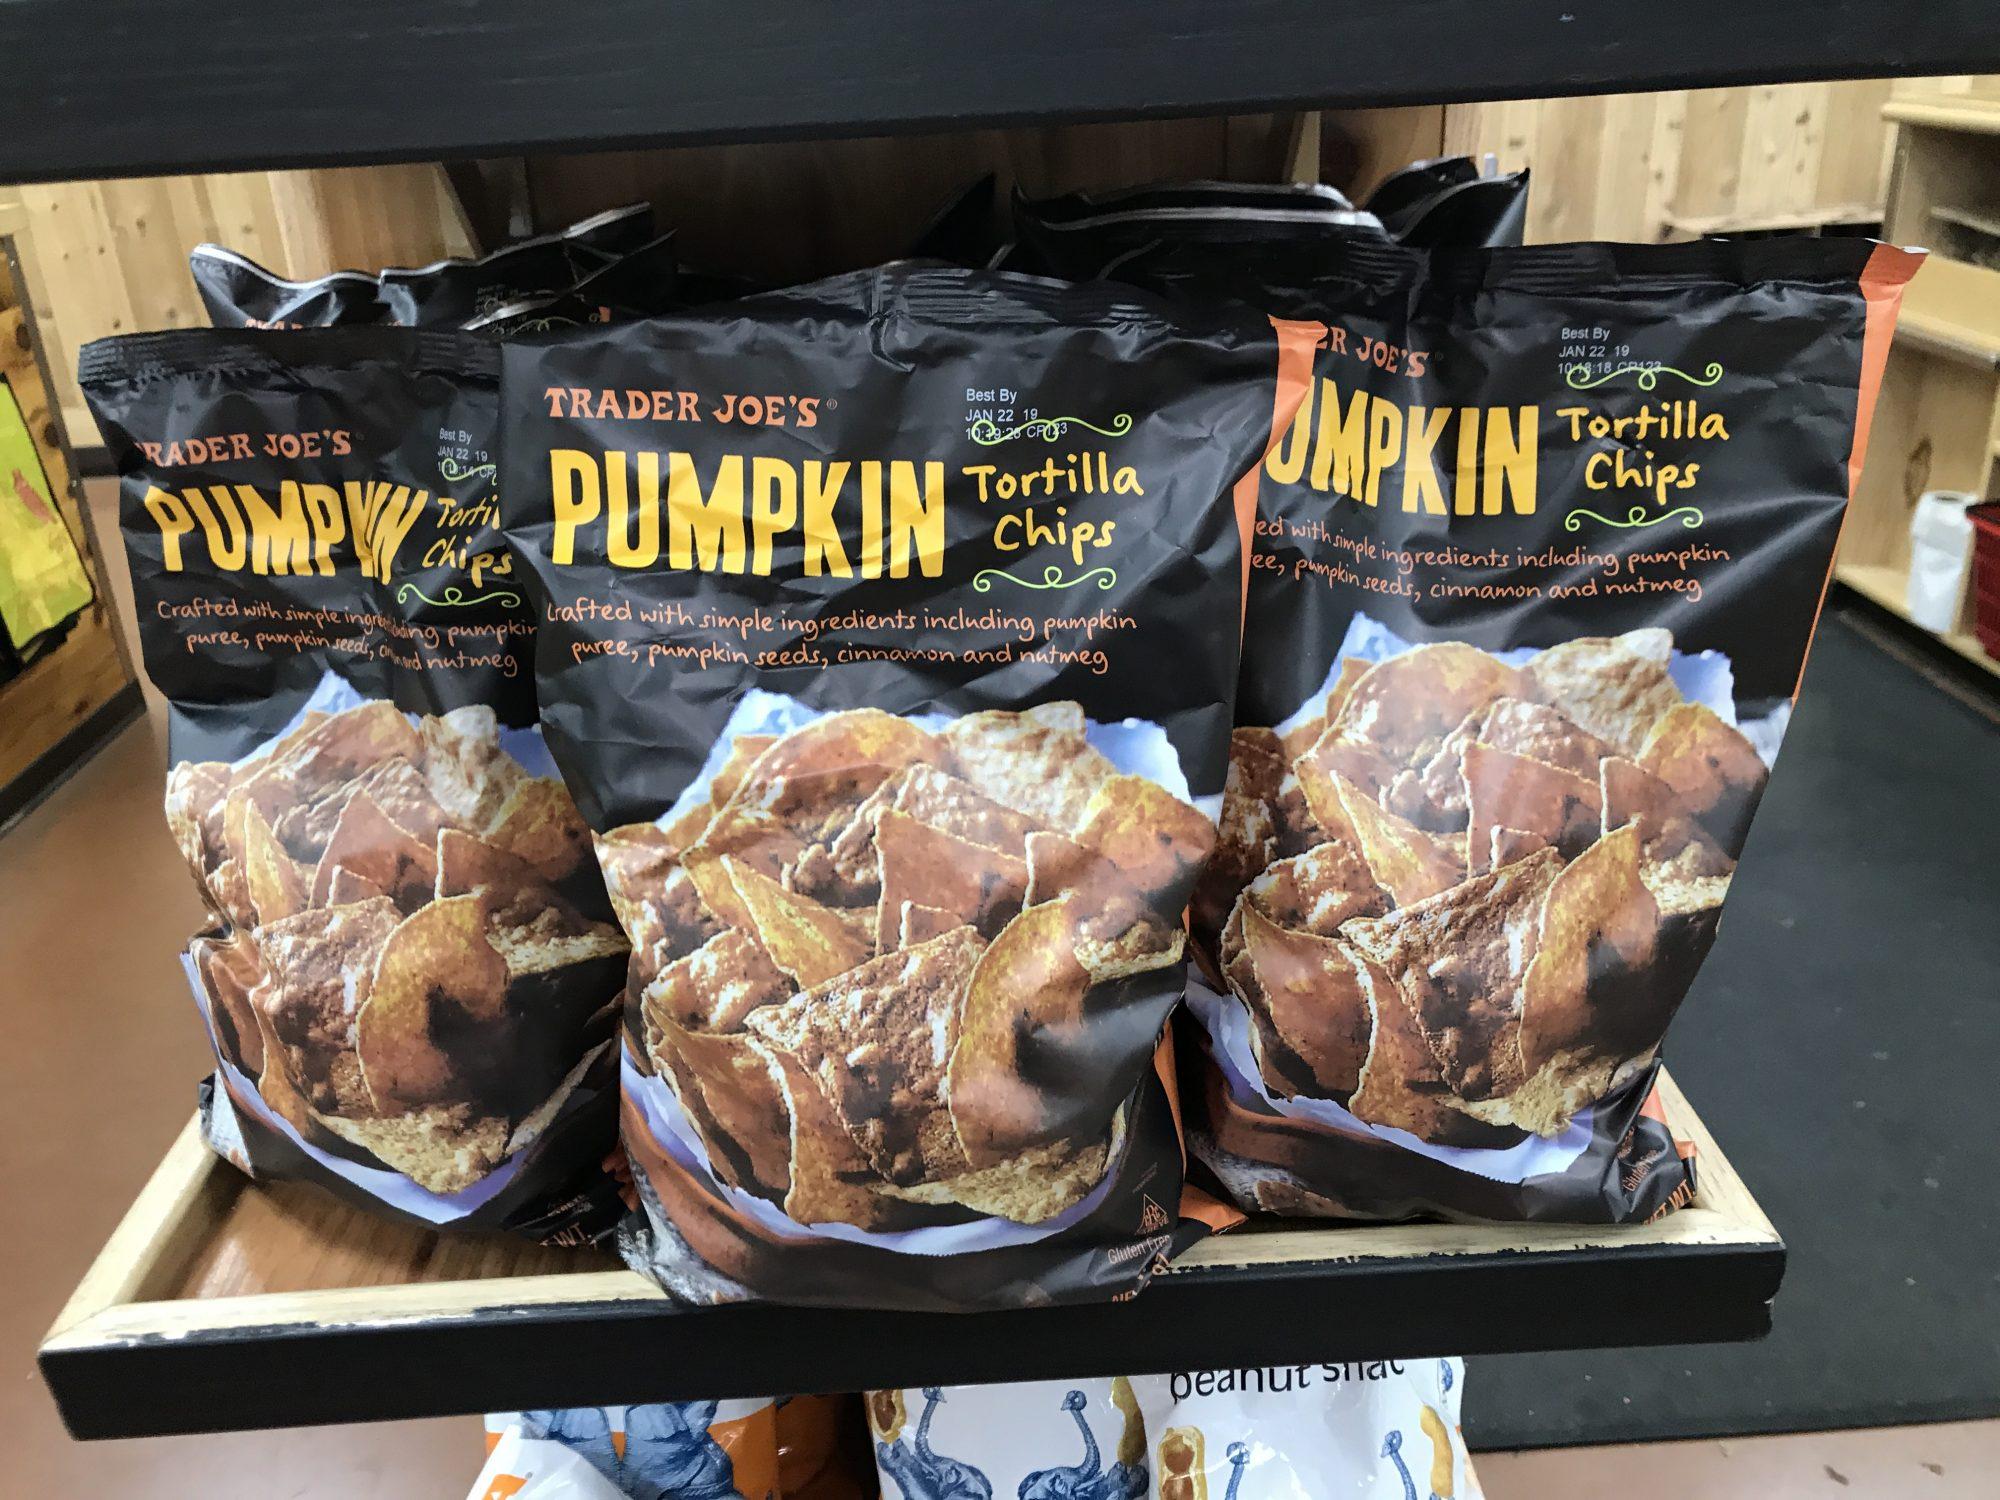 TJ's Pumpkin Tortilla Chips